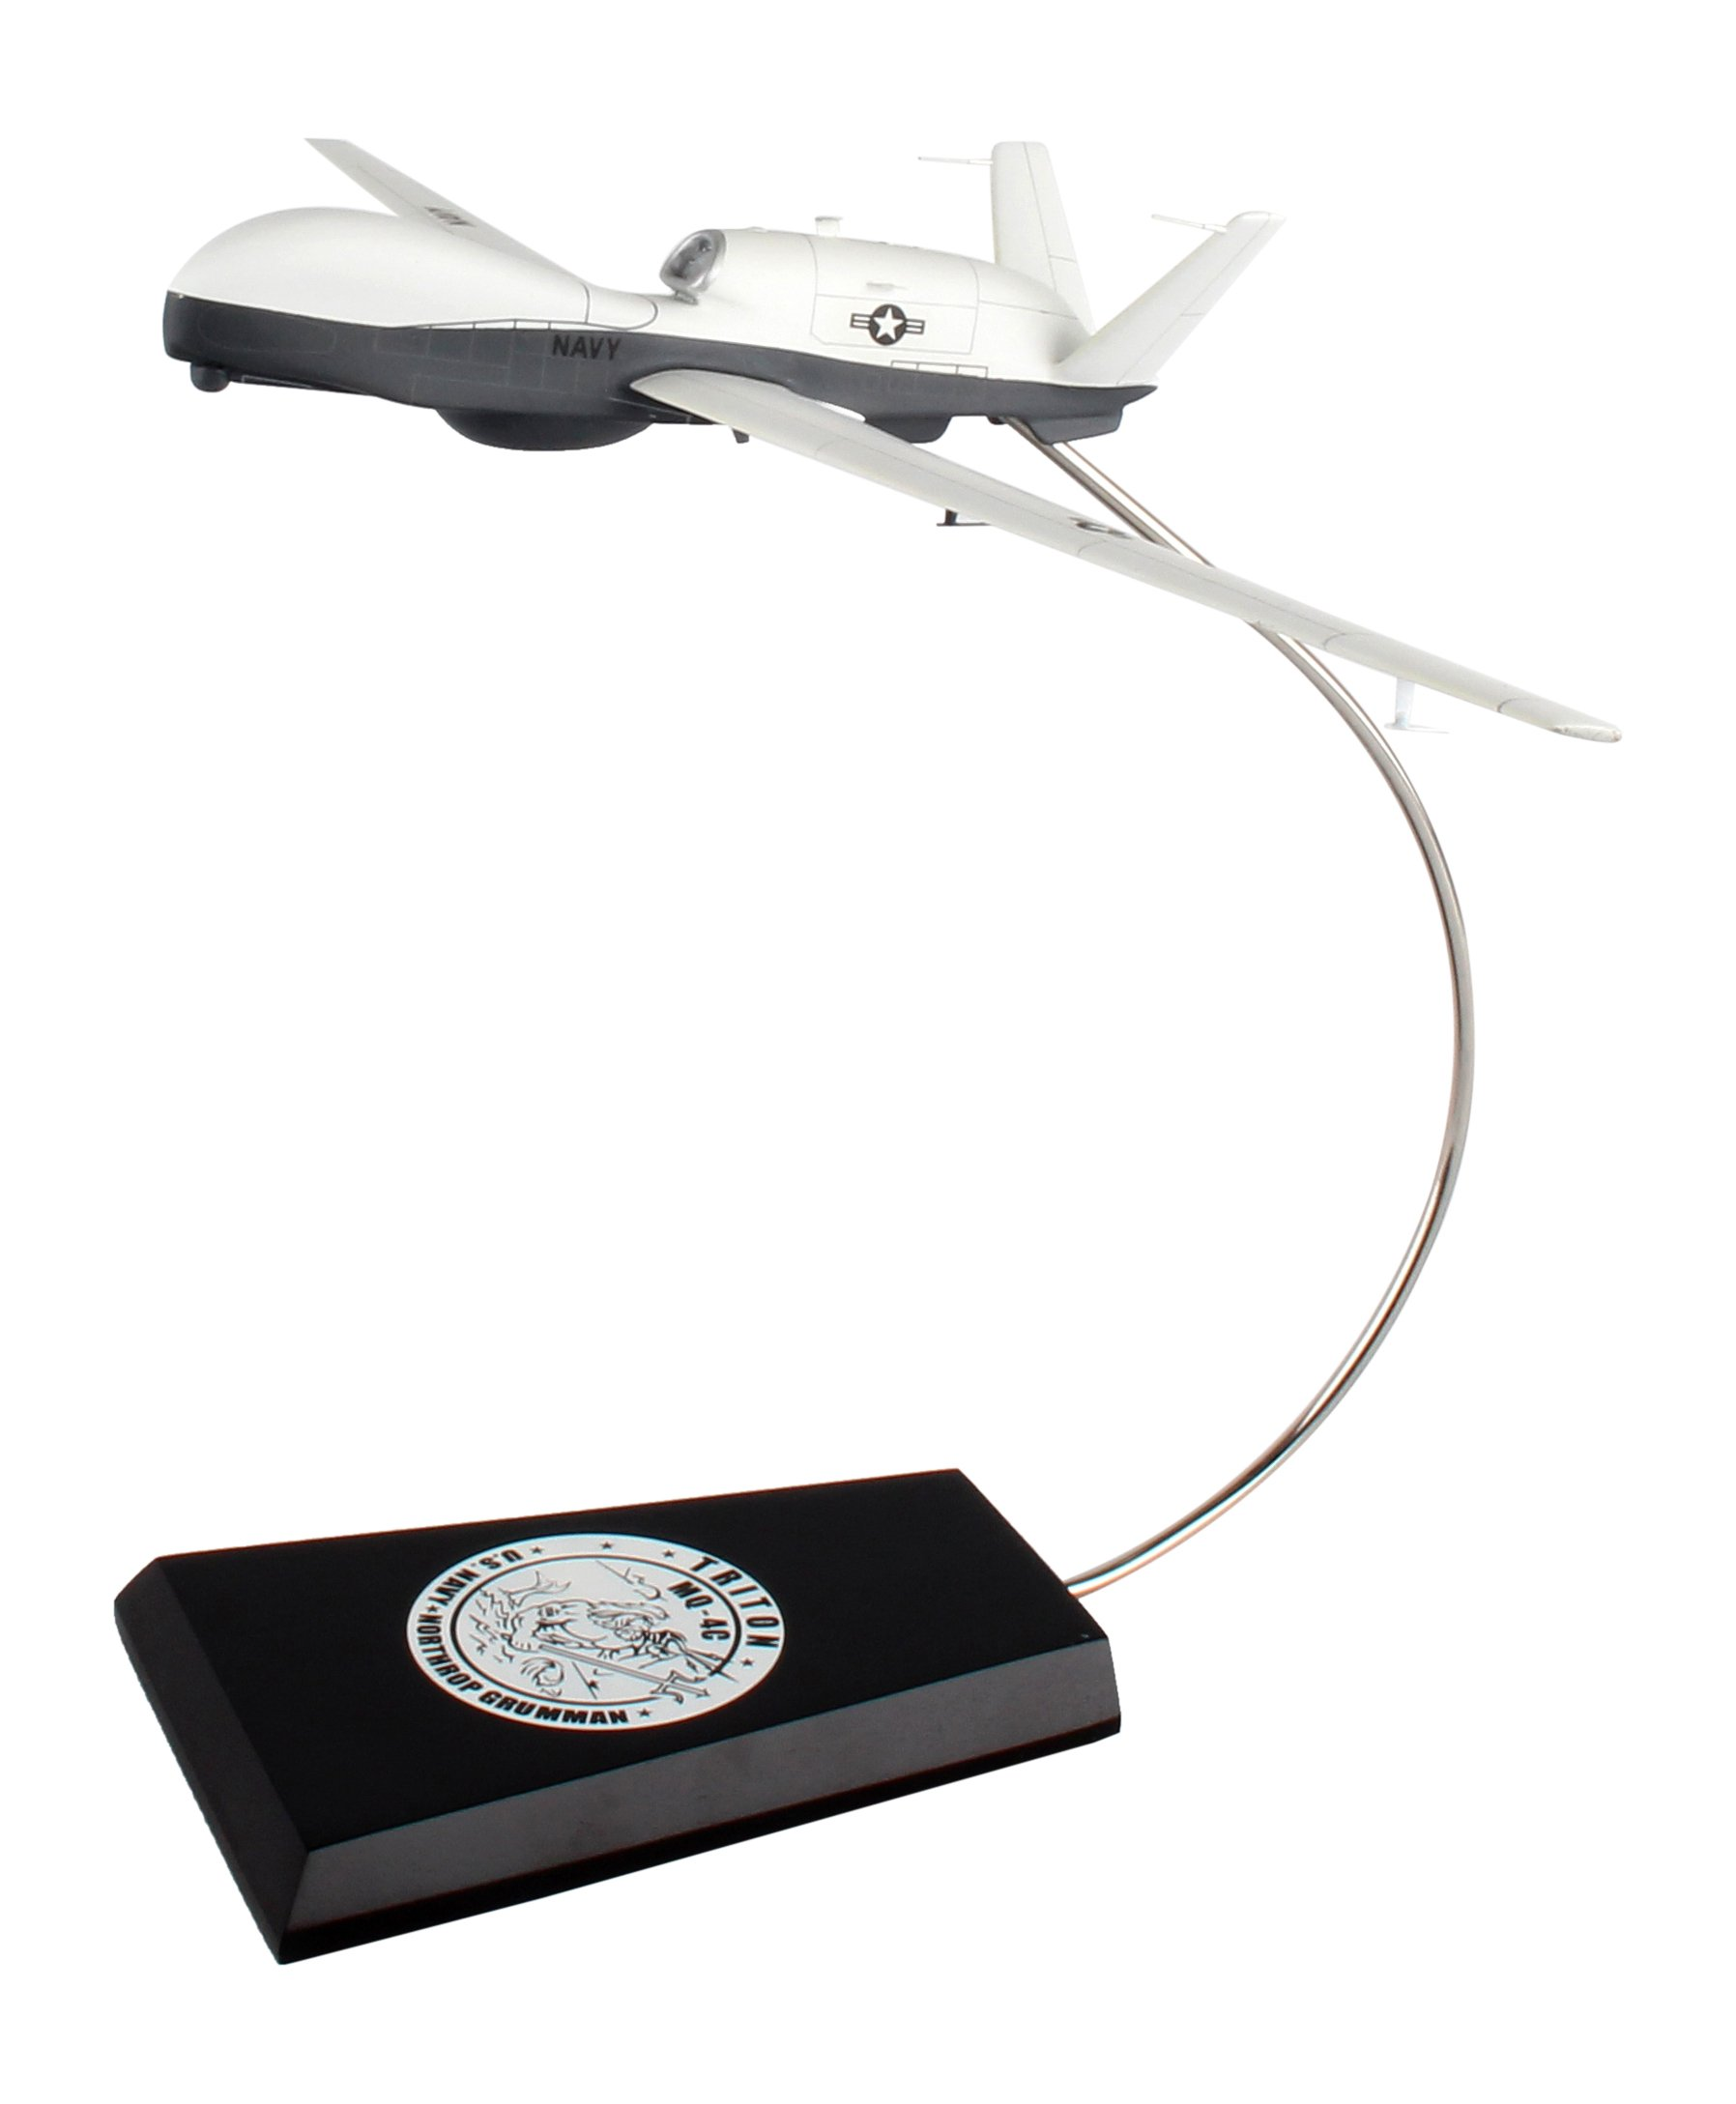 Executive Series Models MQ-4C Triton Building Kit (1/78 Scale) by Executive Series Models